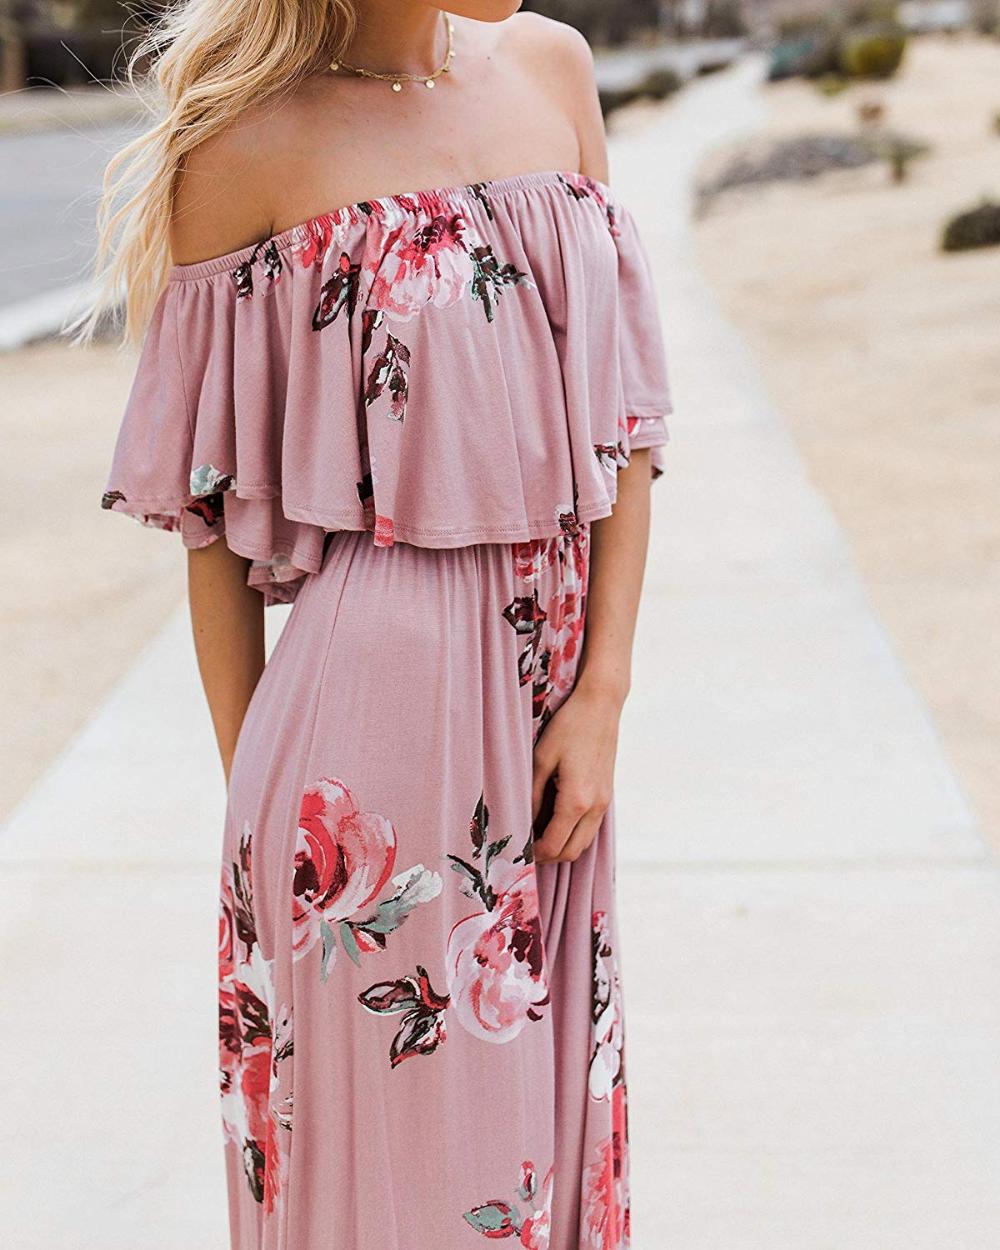 Womens Summer Floral Off The Shoulder Dress Flowing Summer Dresses Pretty Summer Dresses F Long Dress Casual Summer Boho Chic Dresses Casual Long Maxi Dress [ 1250 x 1000 Pixel ]